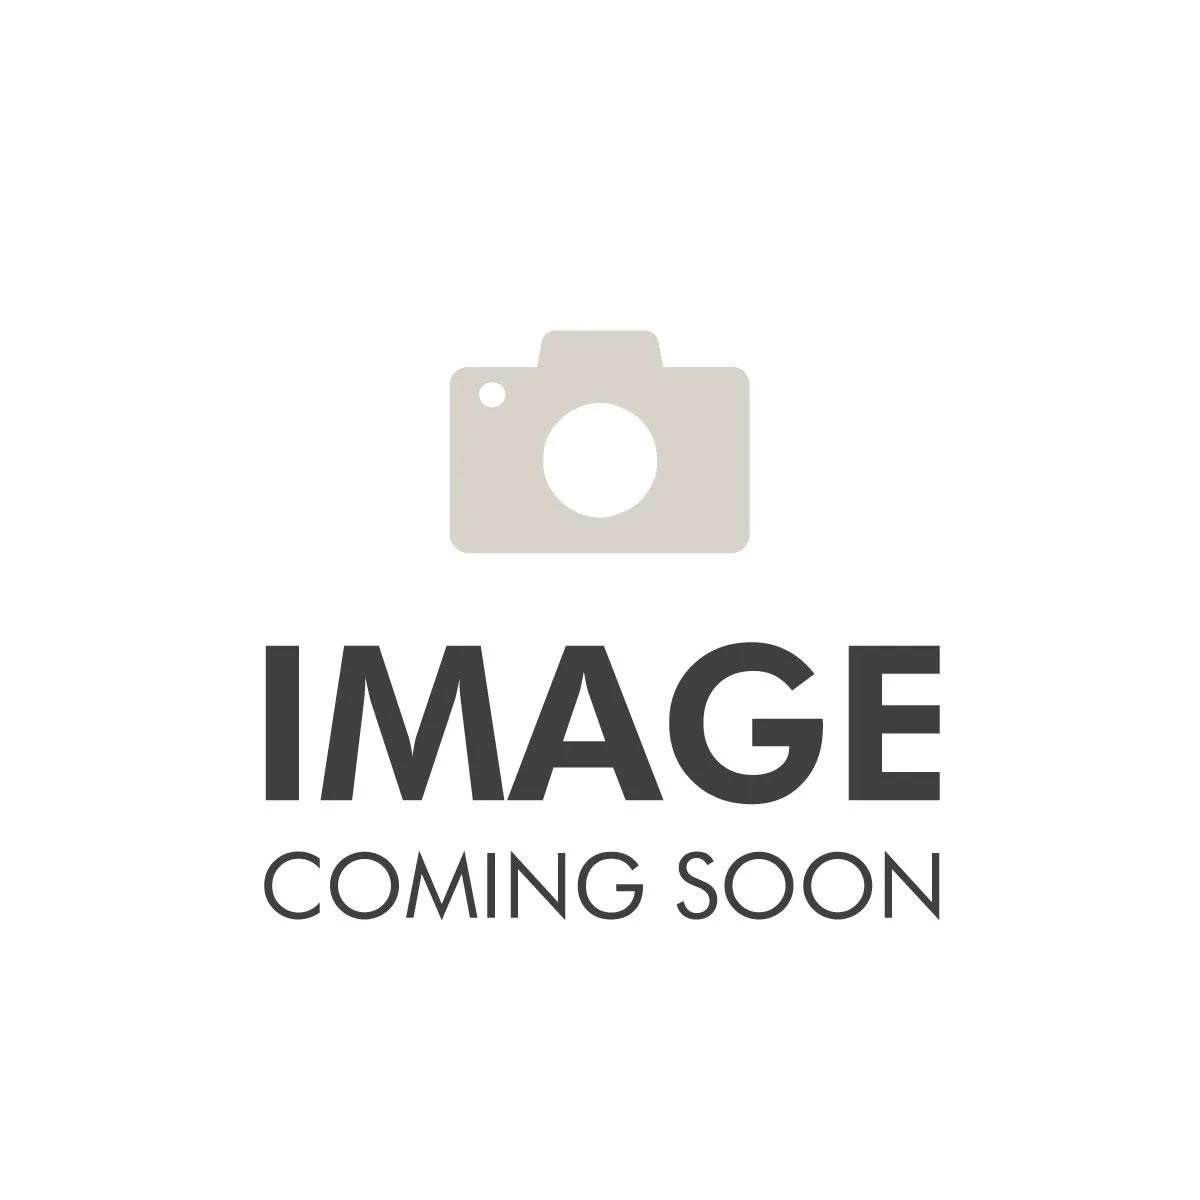 Xhd Soft Top Black Clear Windows 97-02 Jeep TJ Wrangler